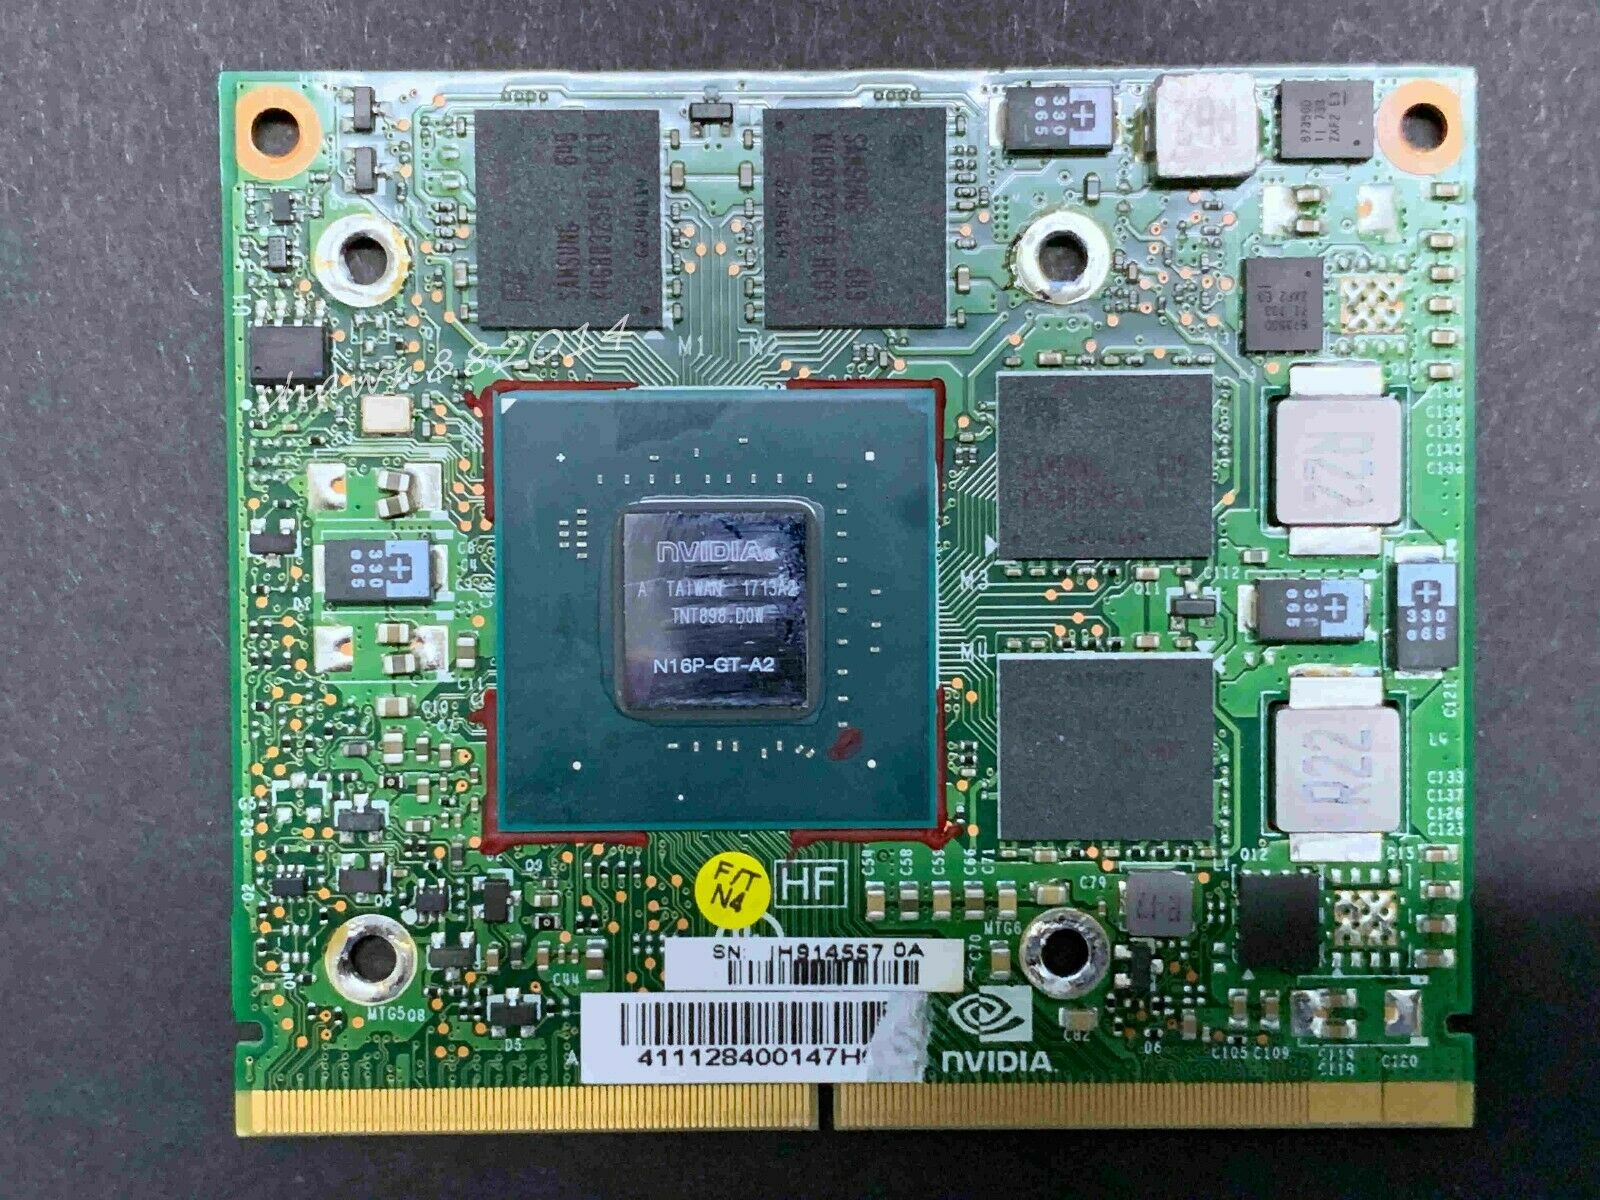 NVIDIA GeForce GTX 950M 4GB GDDR 5 MXM3.0 Tybe